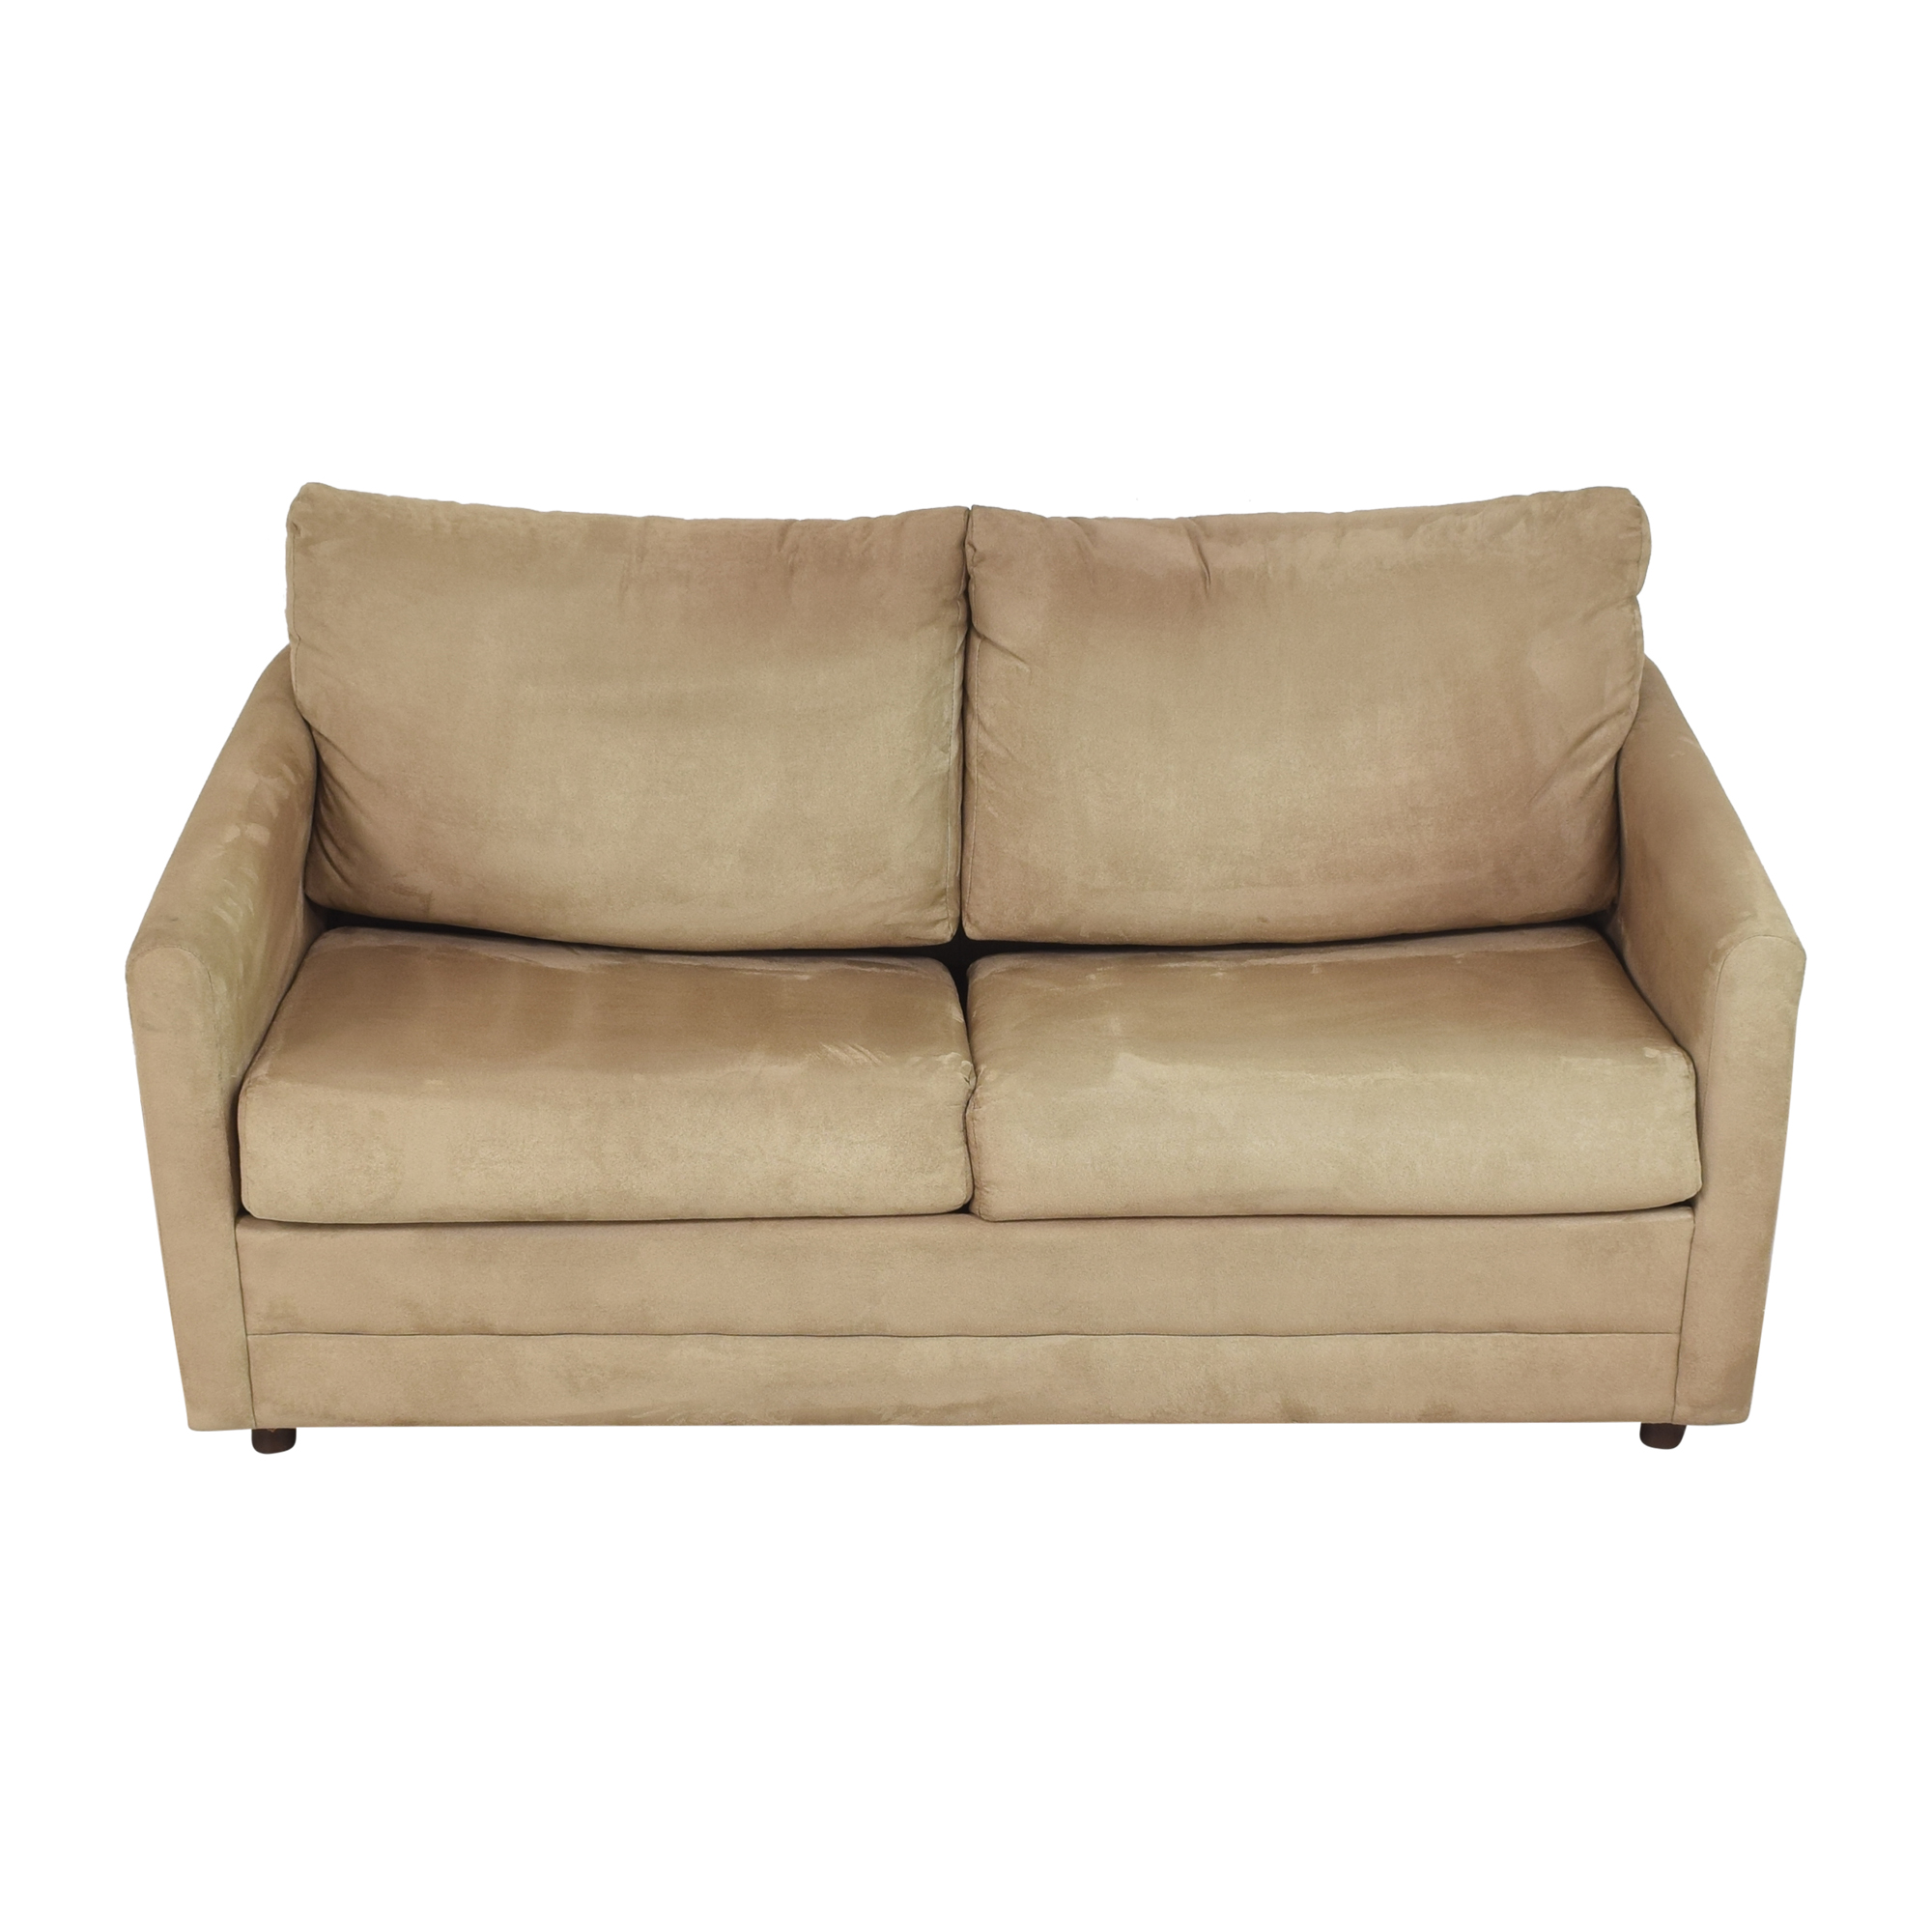 LaCrosse Furniture Lacrosse Furniture Two Cushion Sleeper Loveseat price